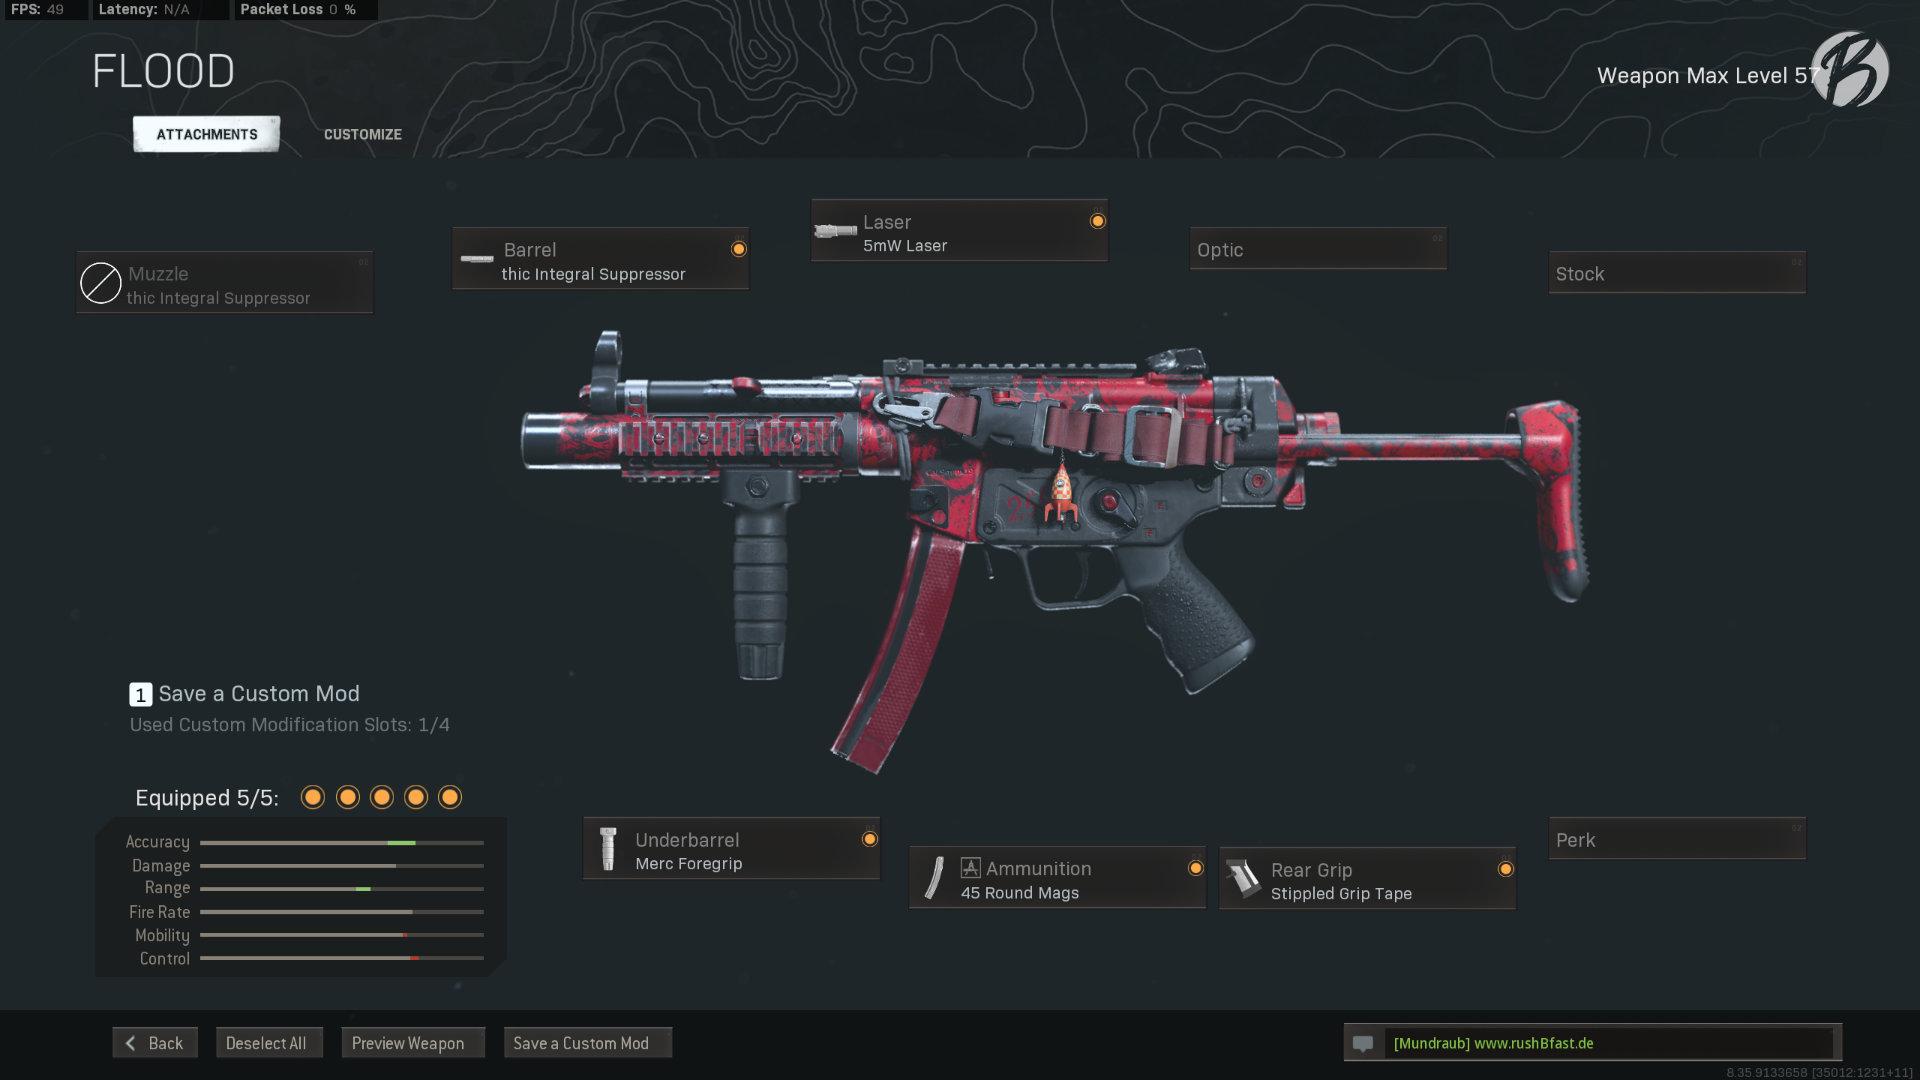 Call of Duty Warzone - Cold War Season 3 - MP5